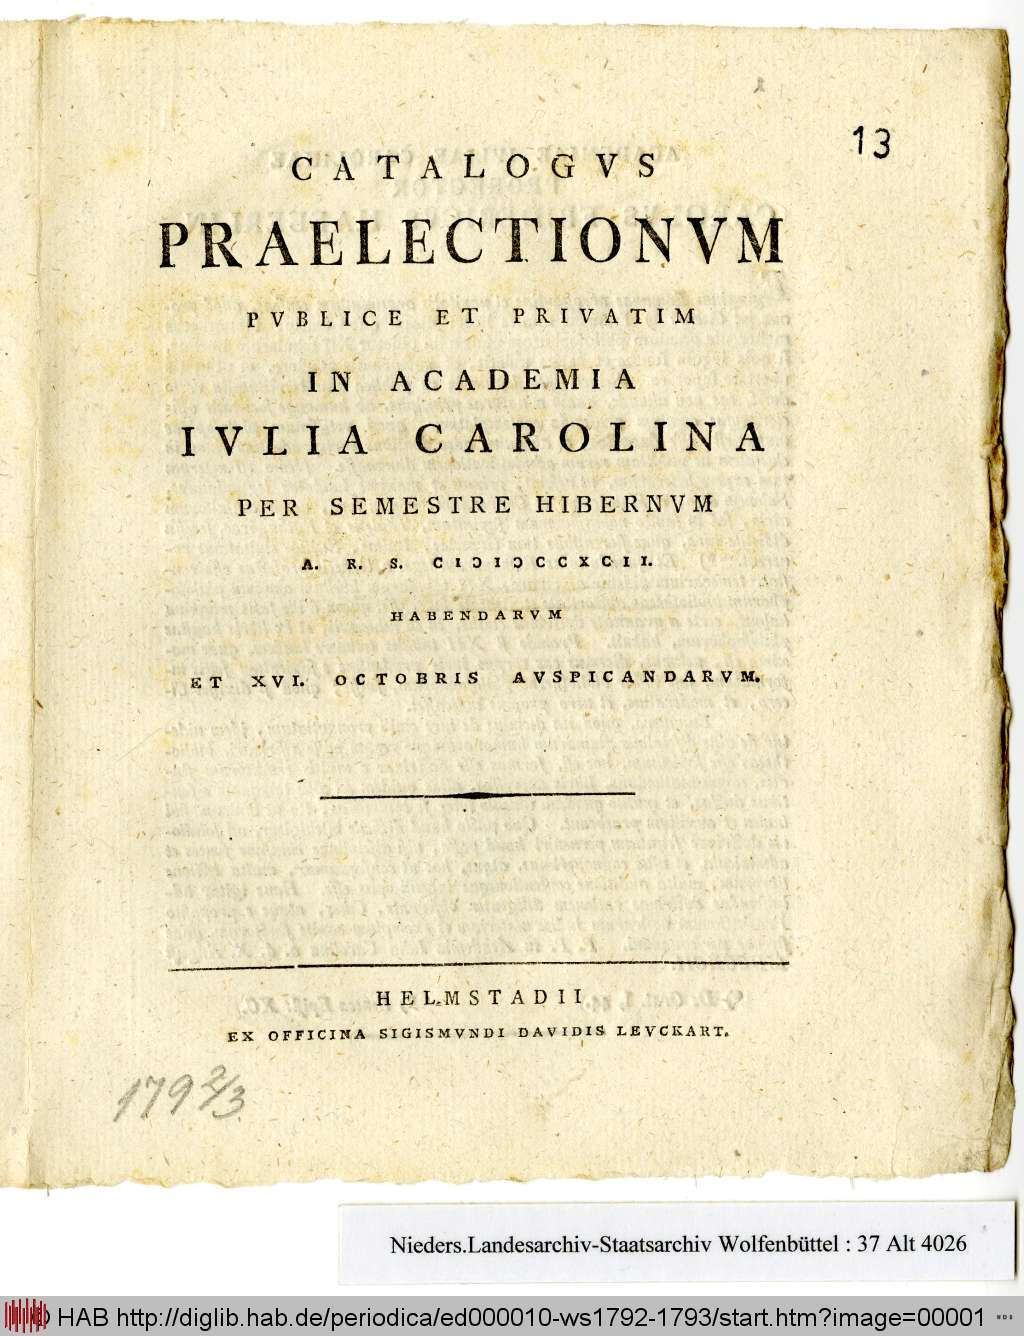 http://diglib.hab.de/periodica/ed000010-ws1792-1793/00001.jpg